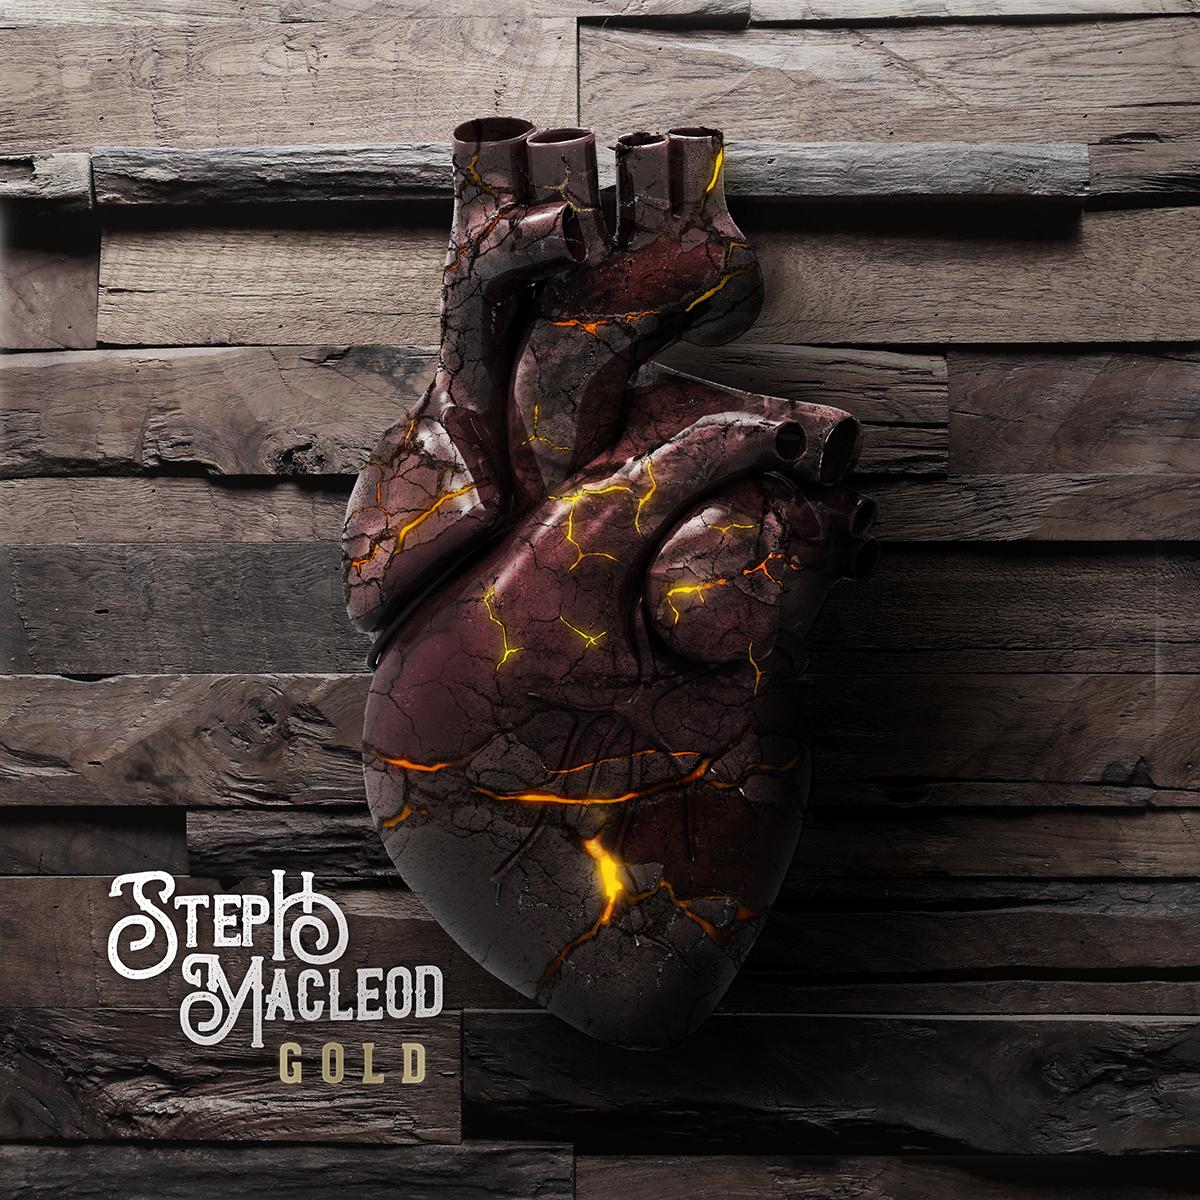 Steph Macleod - New Album - Gold